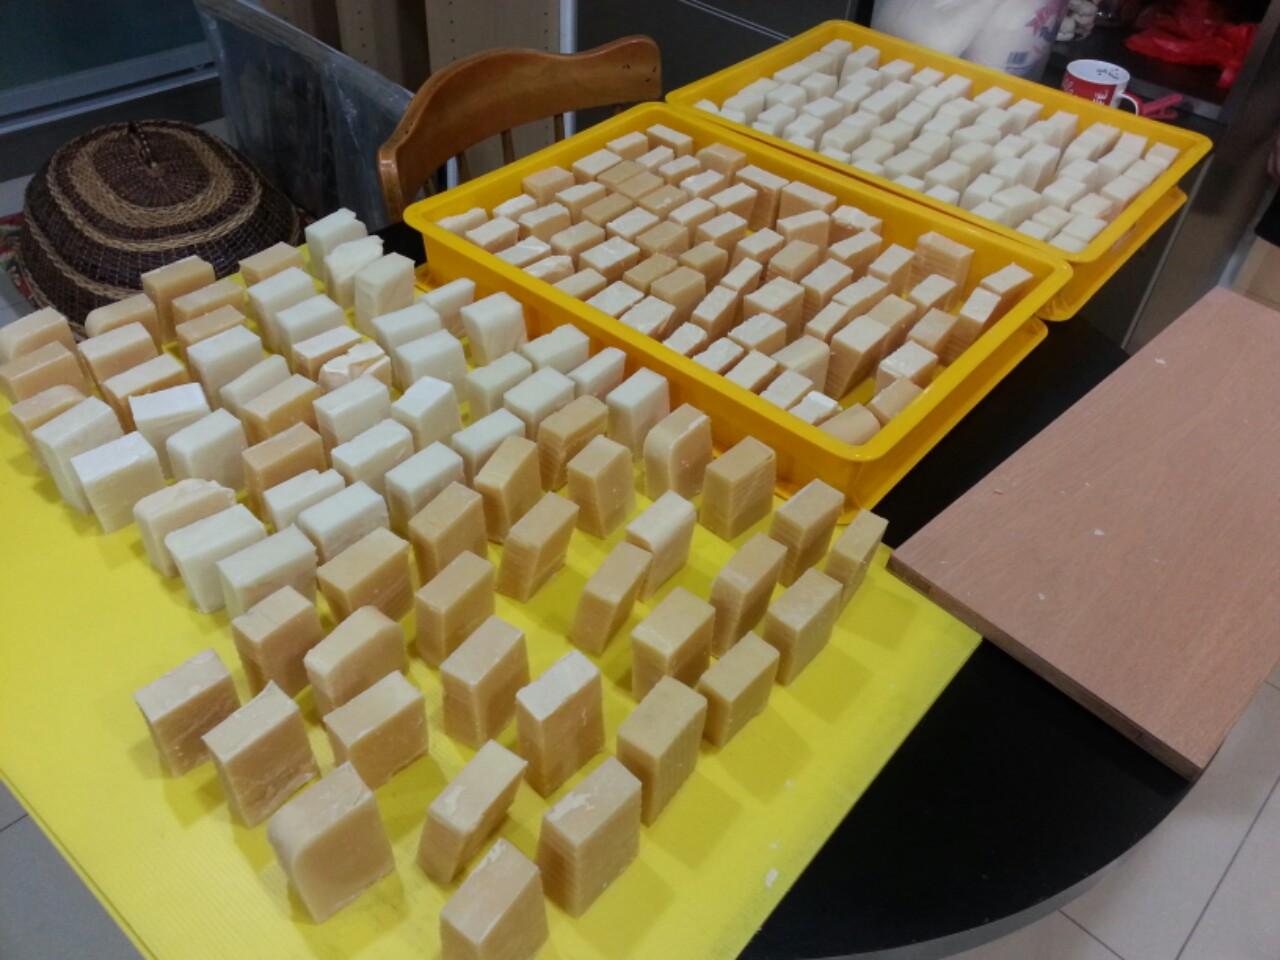 1362364972067 & Soap-making Class door gifts | Soap-making Malaysia \u2013 Kalleo ...